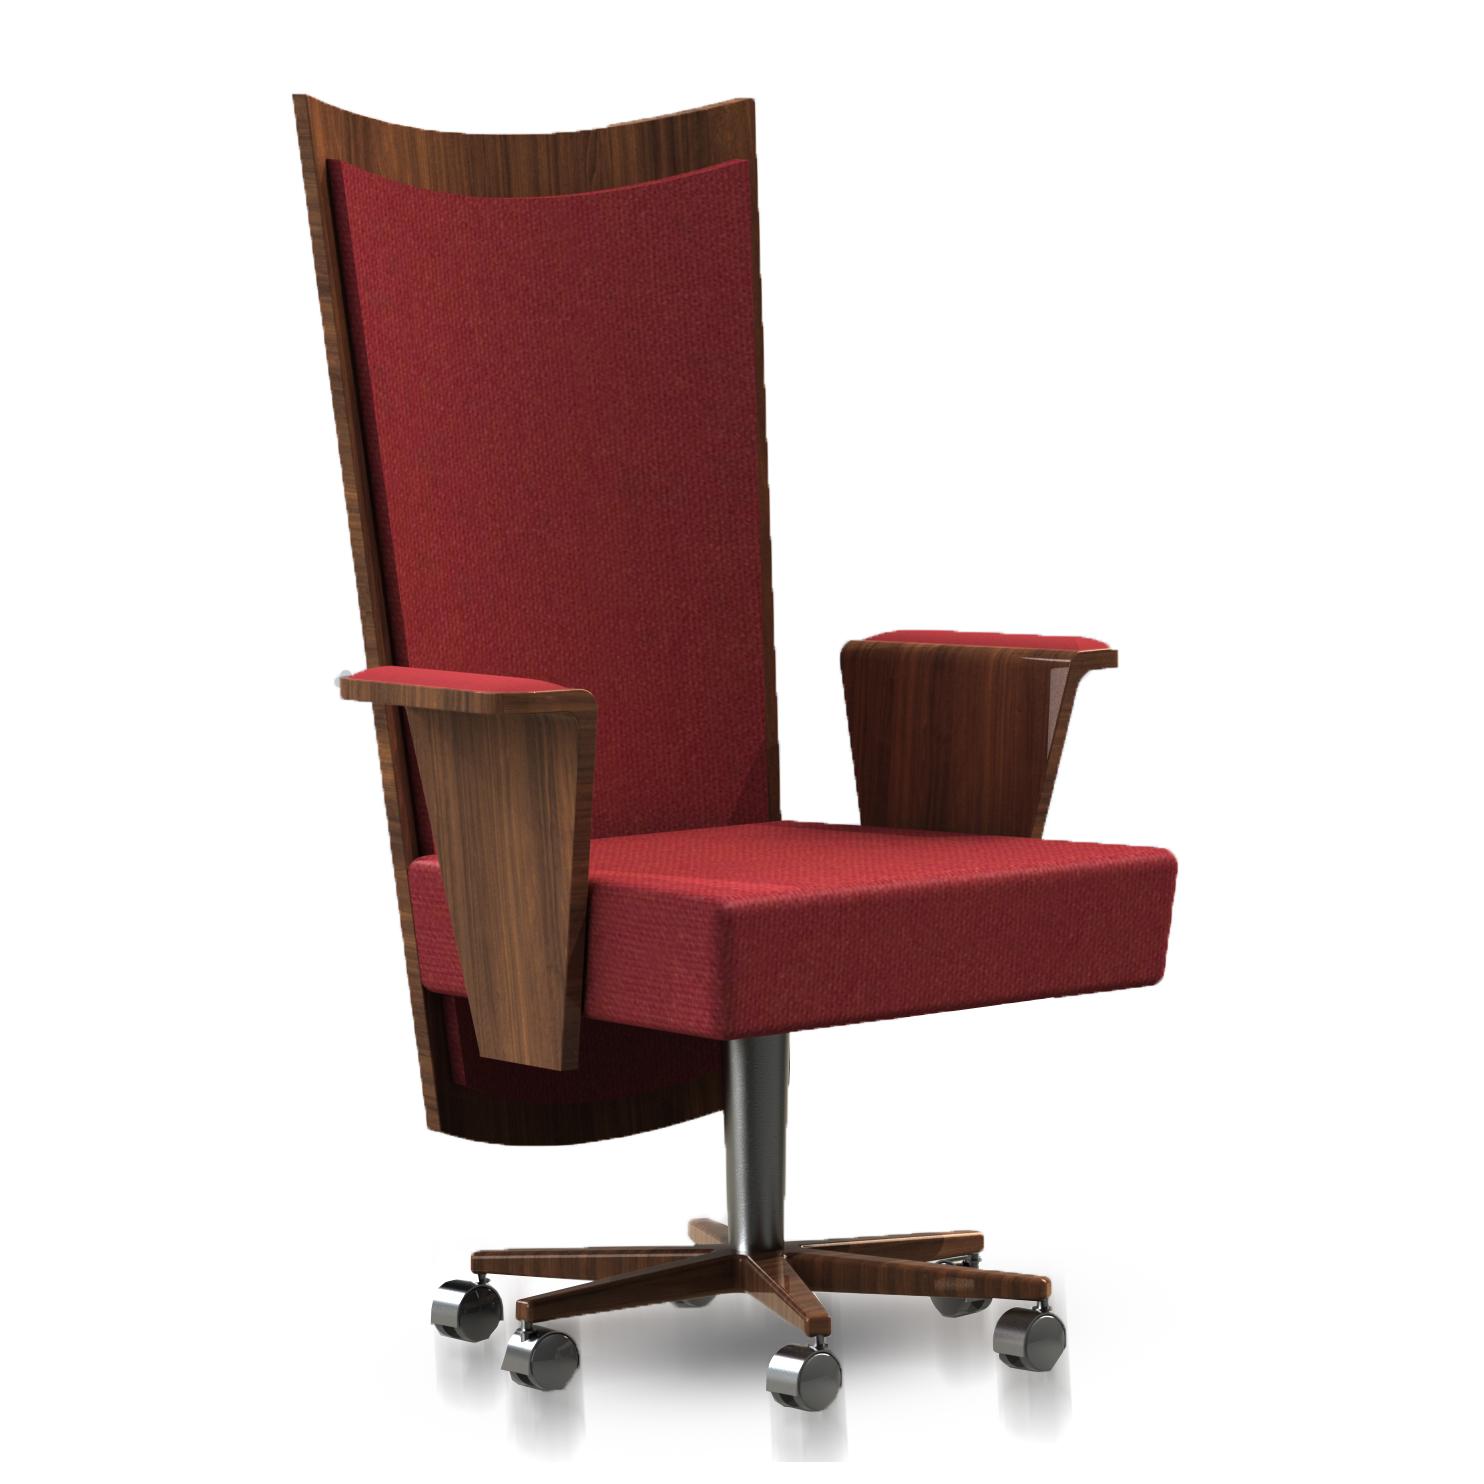 Giancarlo_Studio_Furniture_Executive_Chair_1.jpg